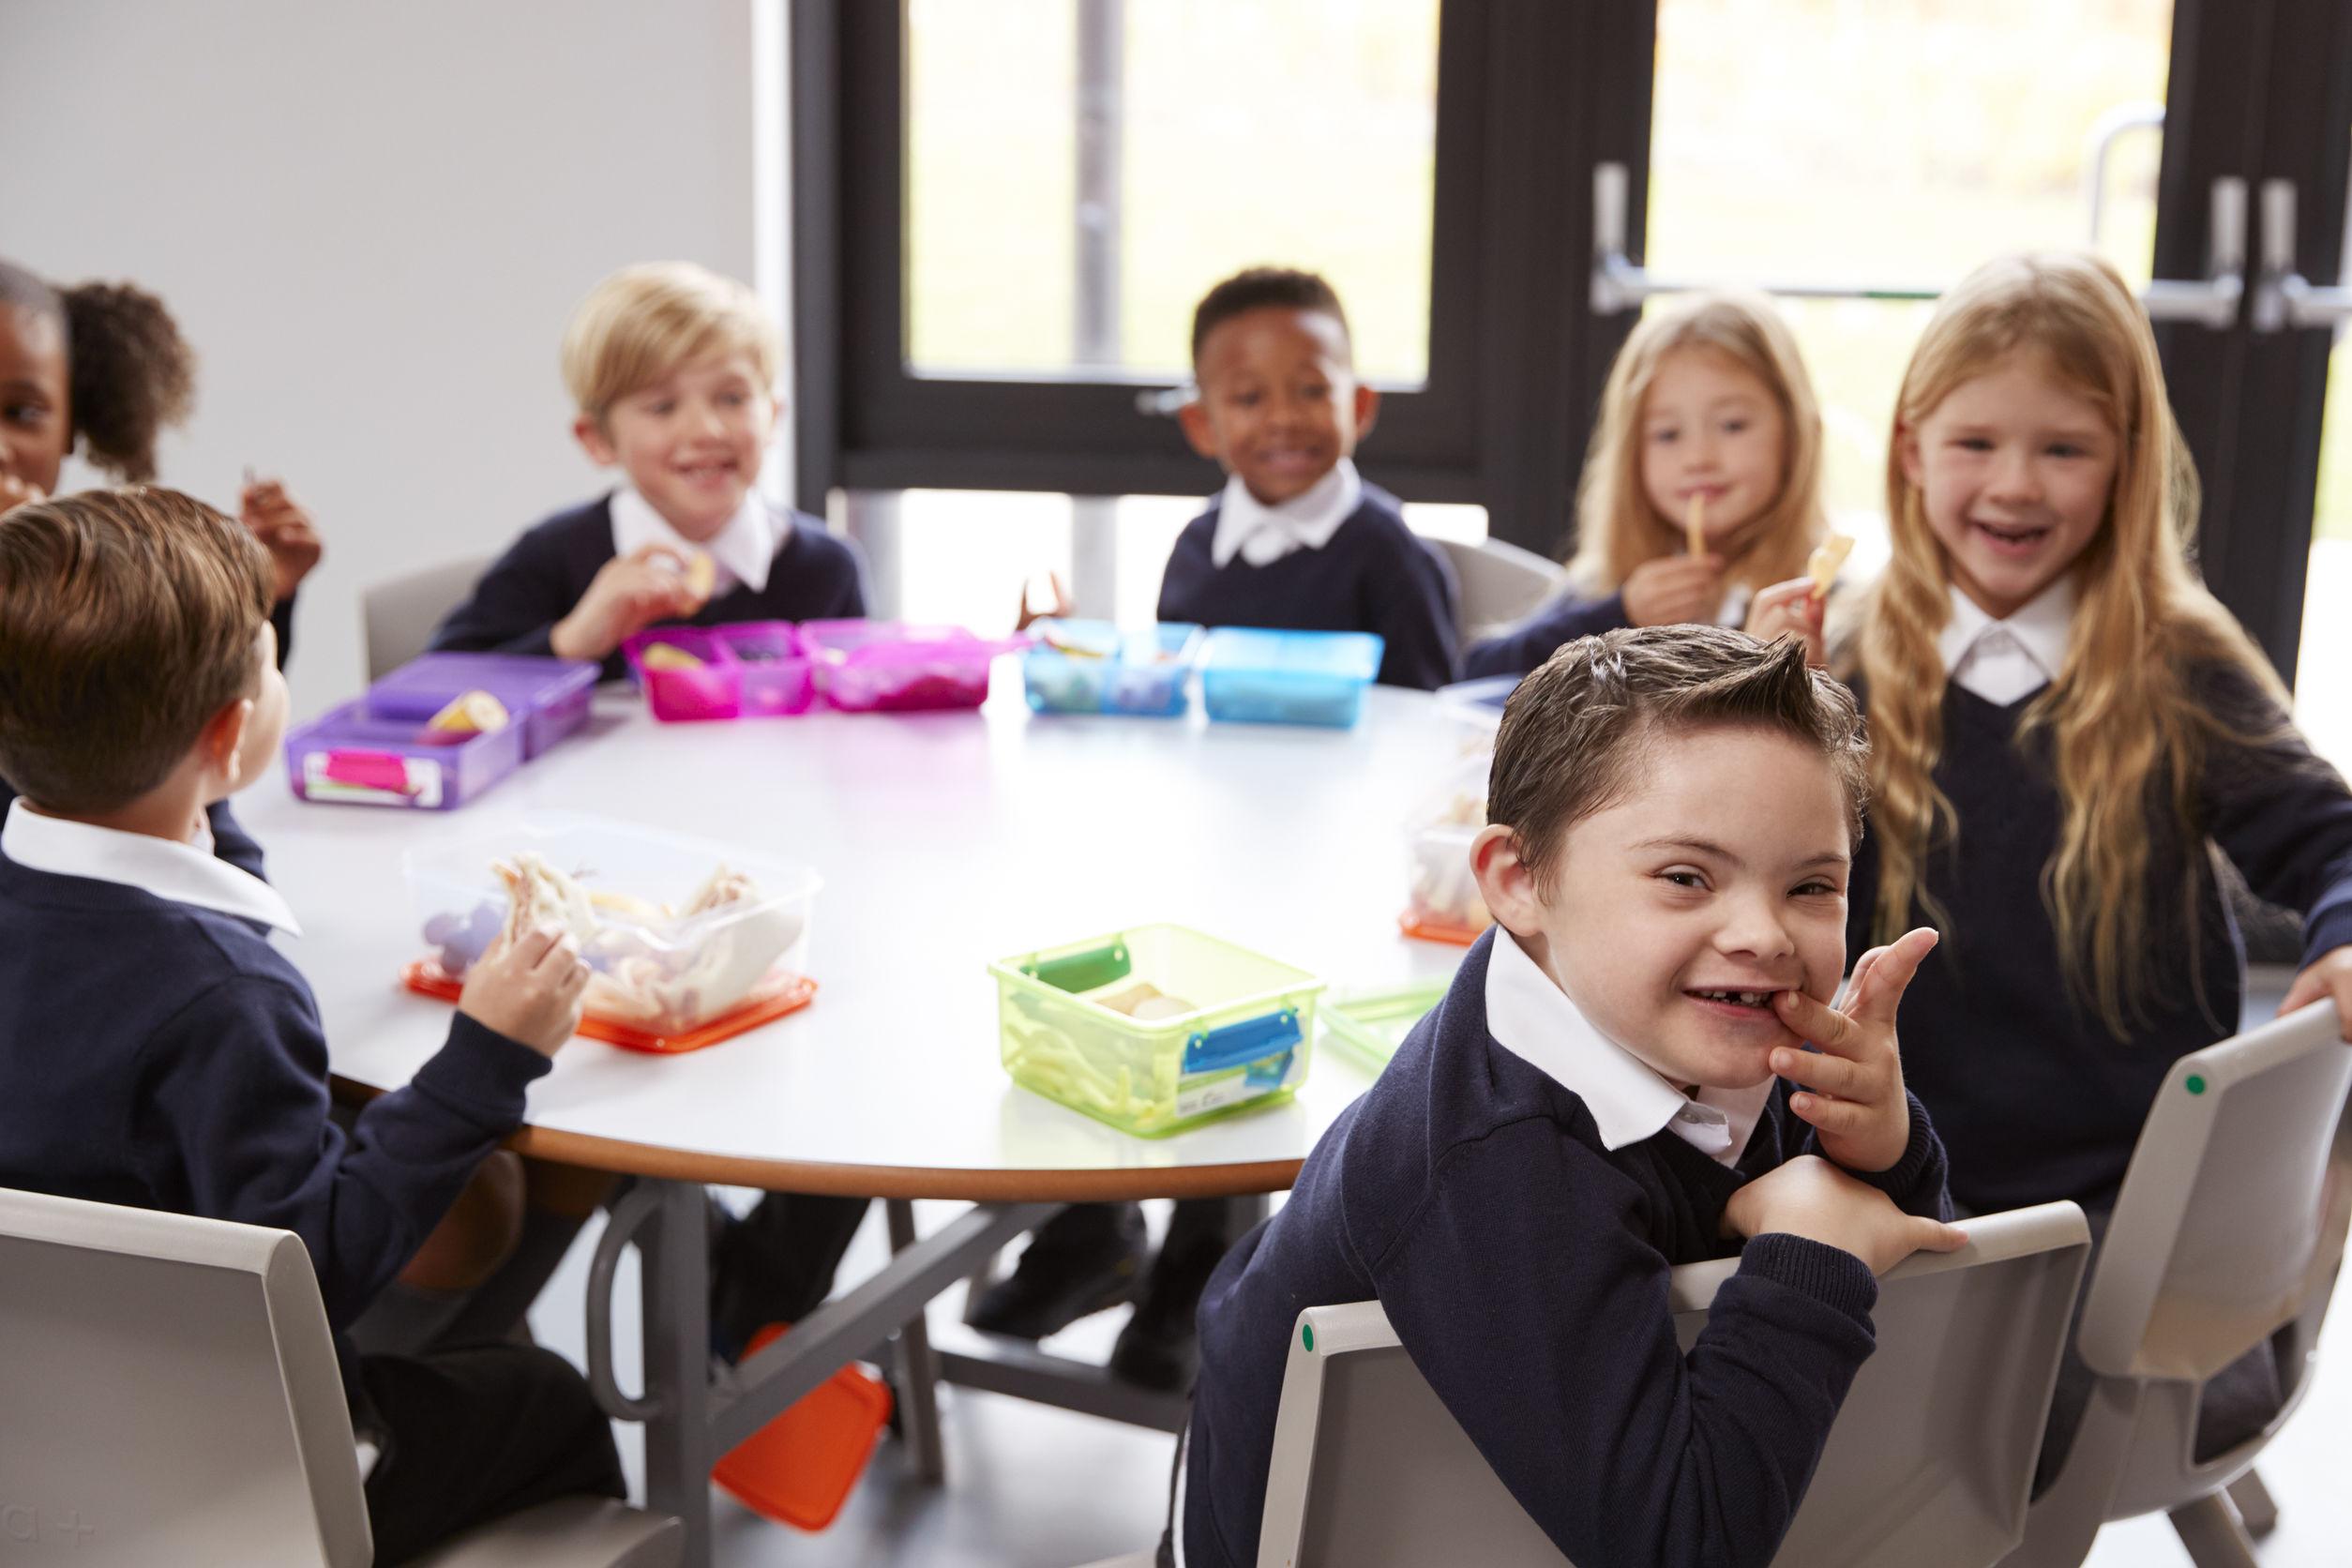 MHSTs, happy schools